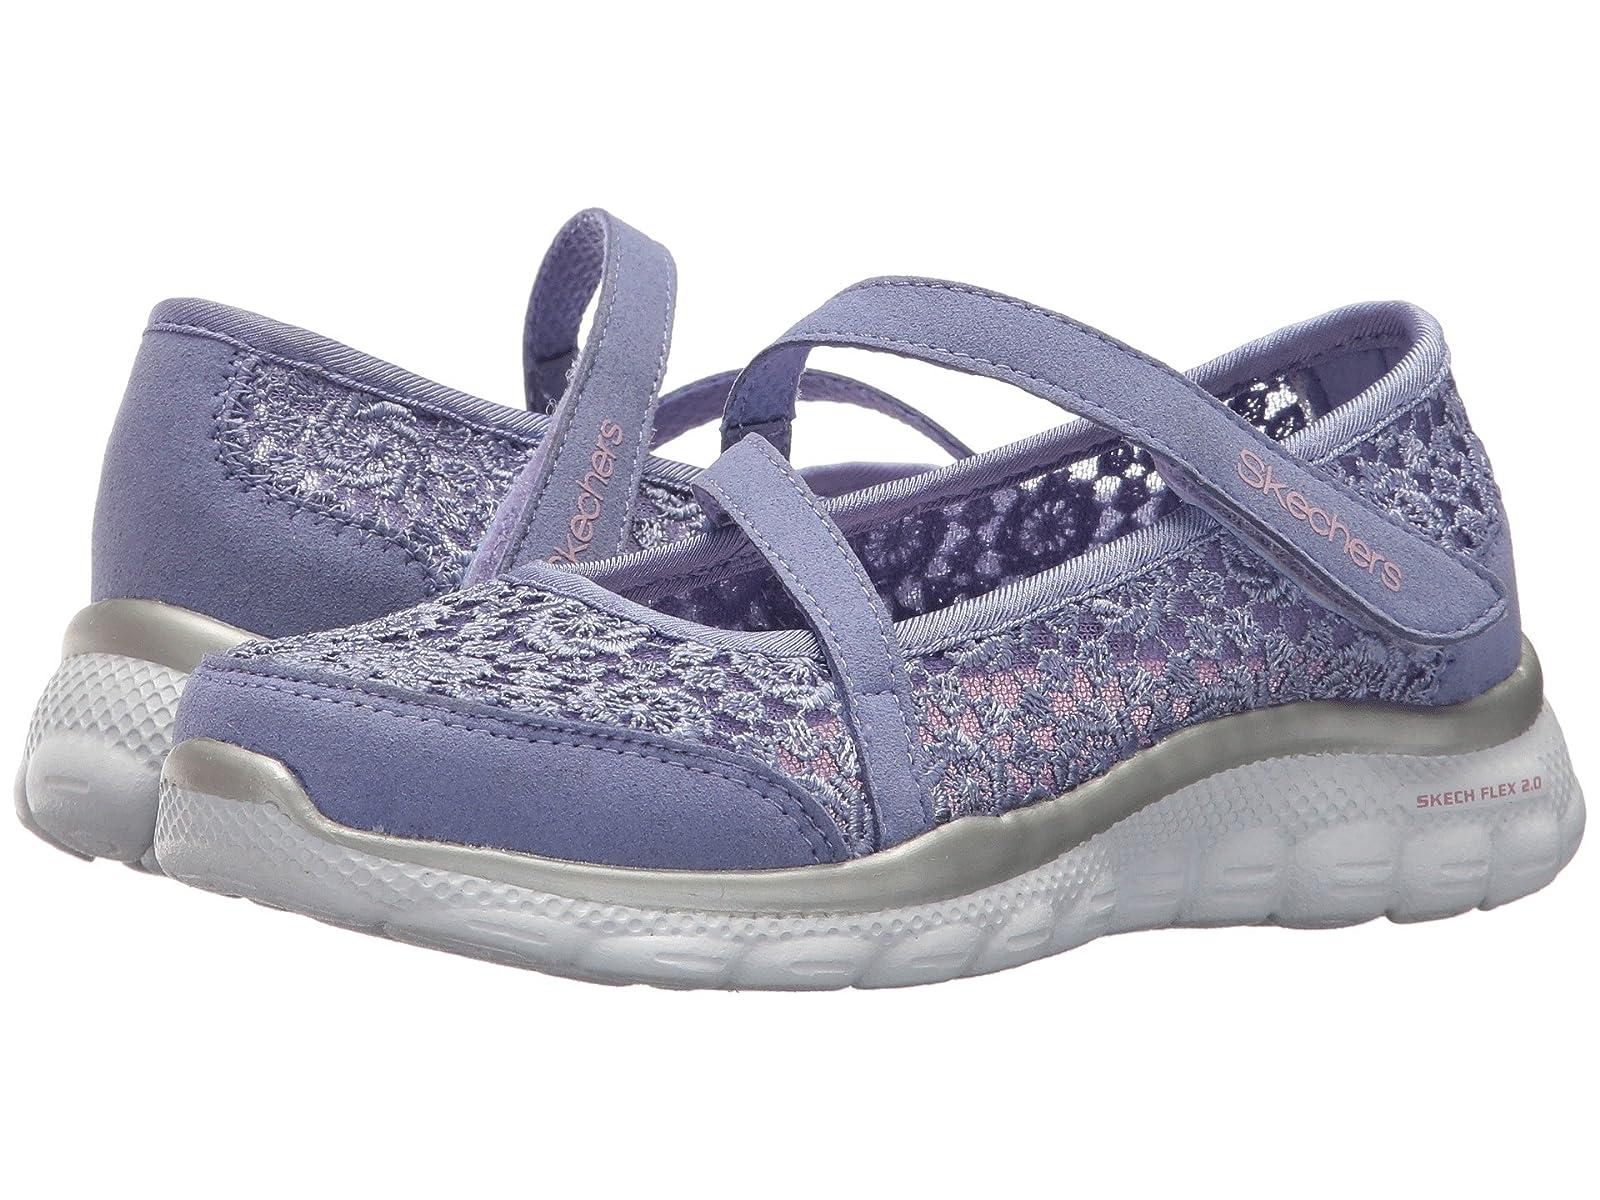 SKECHERS KIDS Skech Flex 2.0 85219L (Little Kid/Big Kid)Cheap and distinctive eye-catching shoes